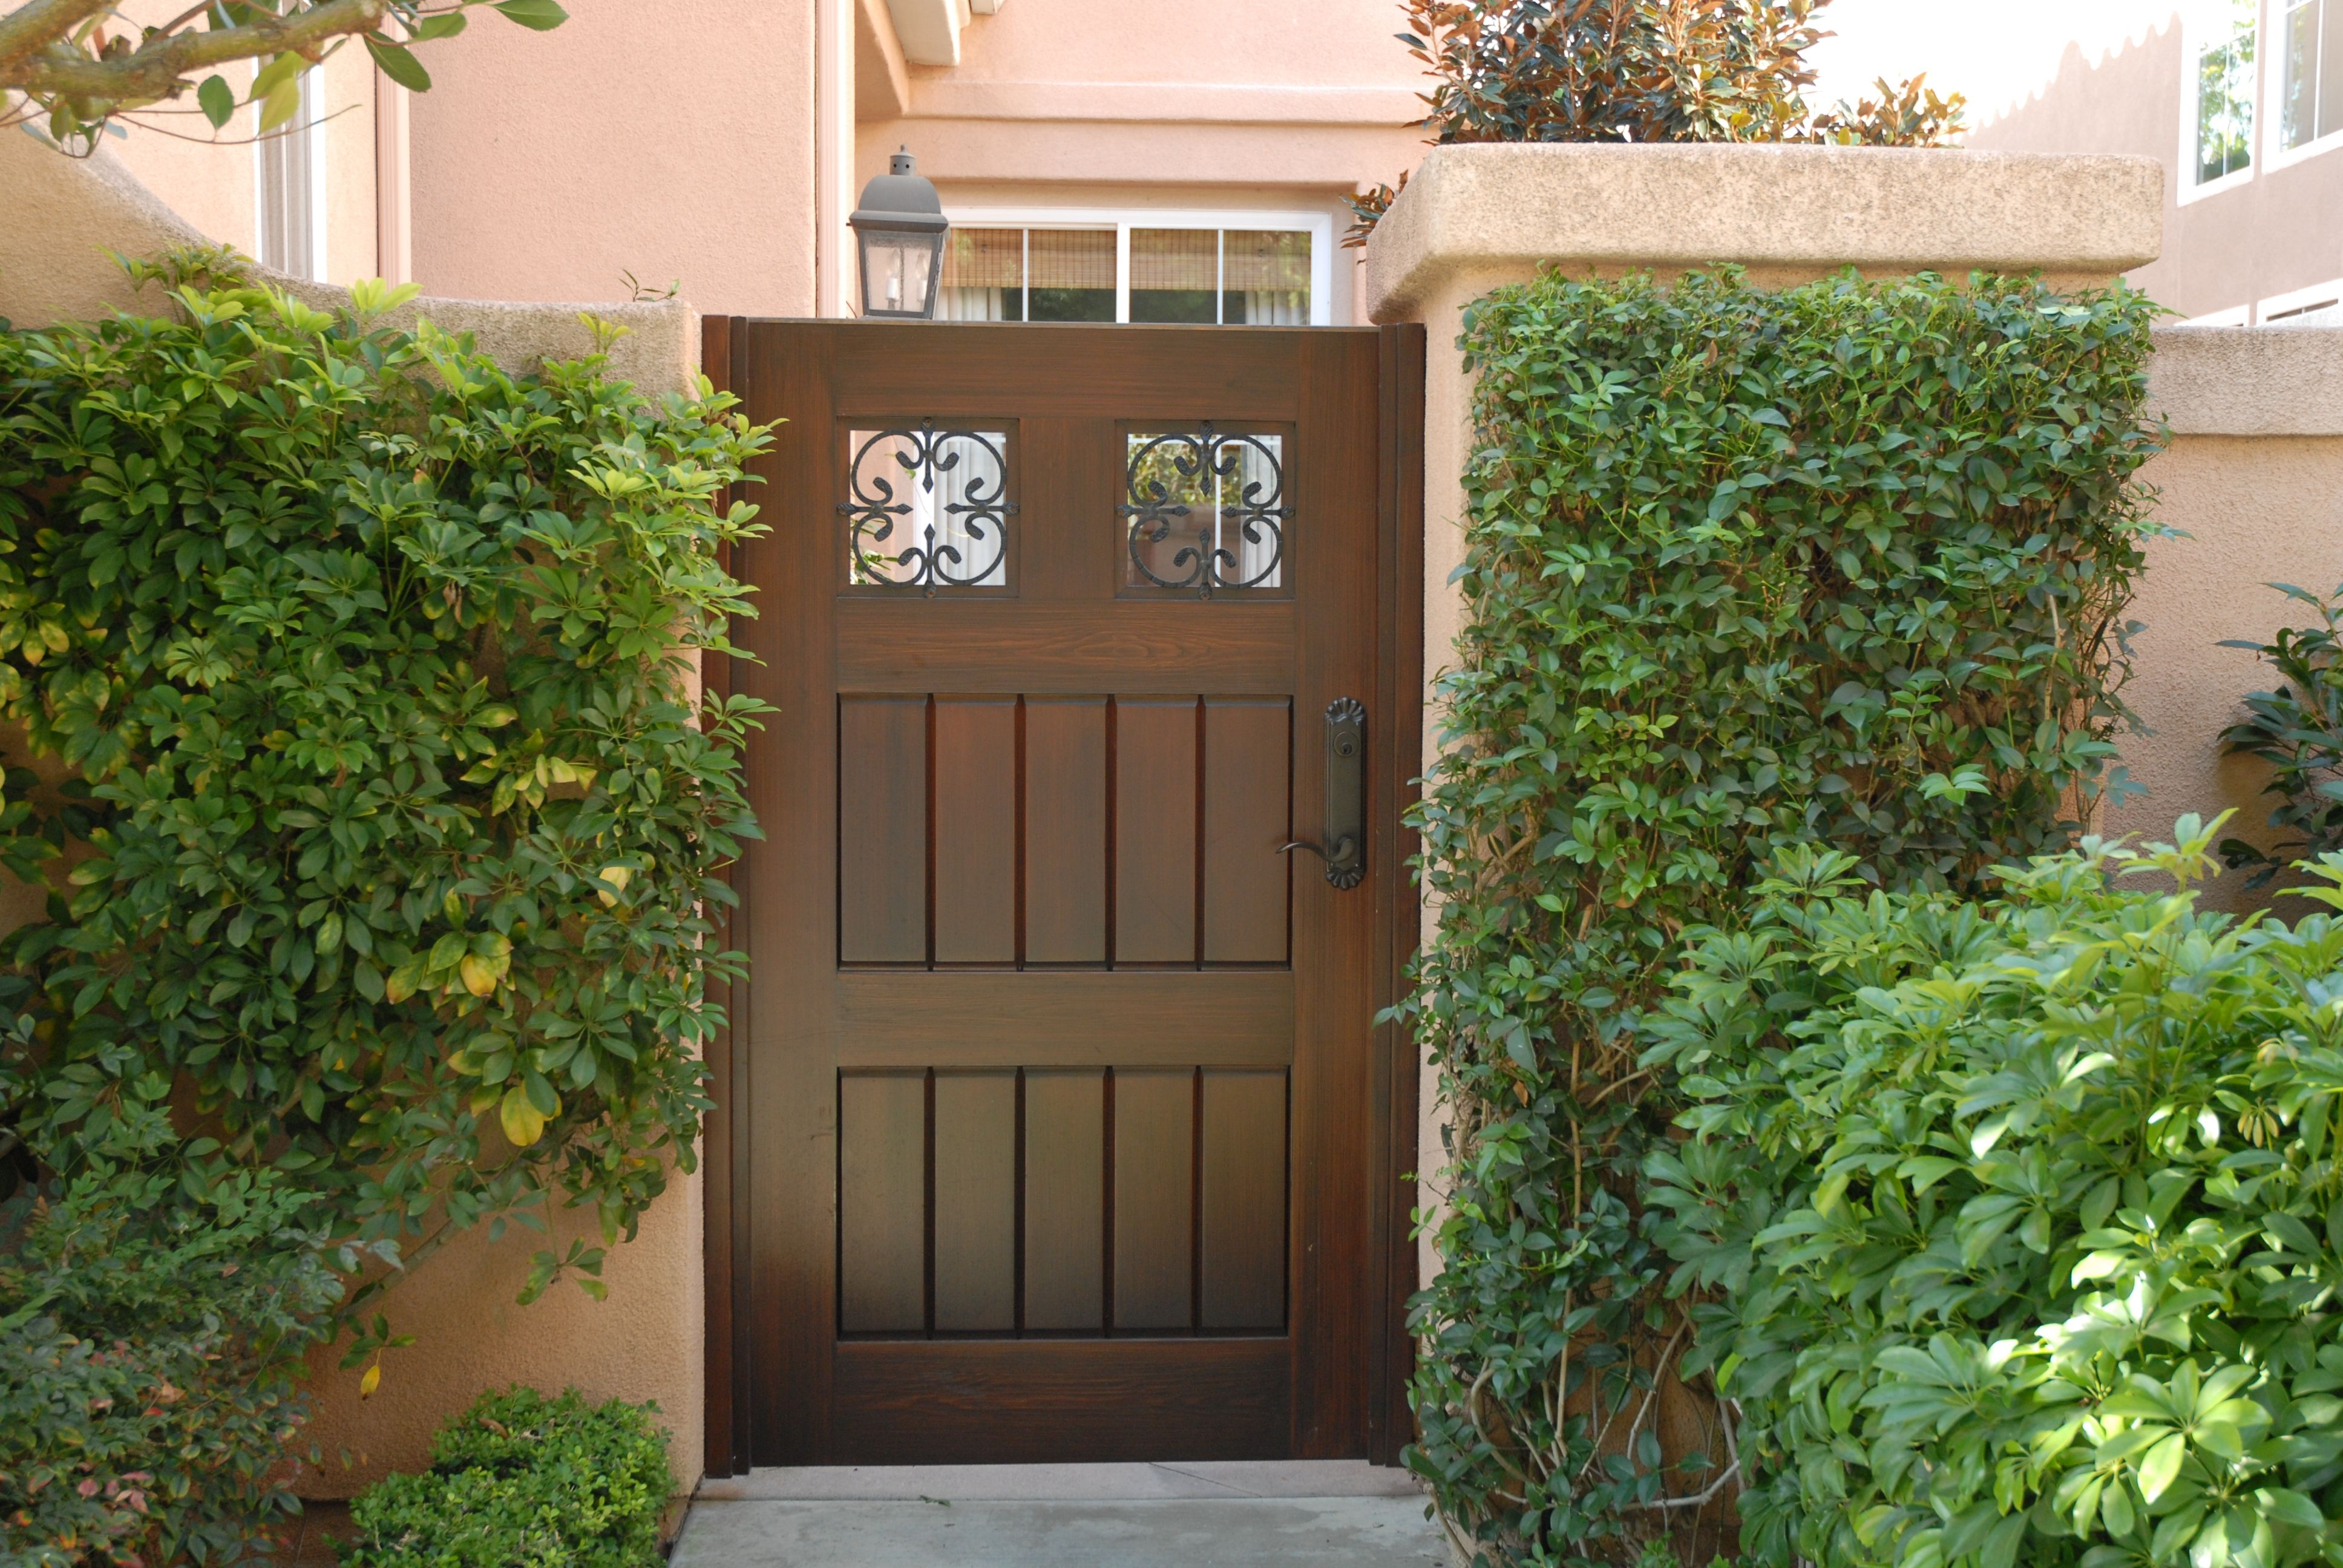 Custom Wood Gates by Garden Passages Premium Wood Gates Features ...